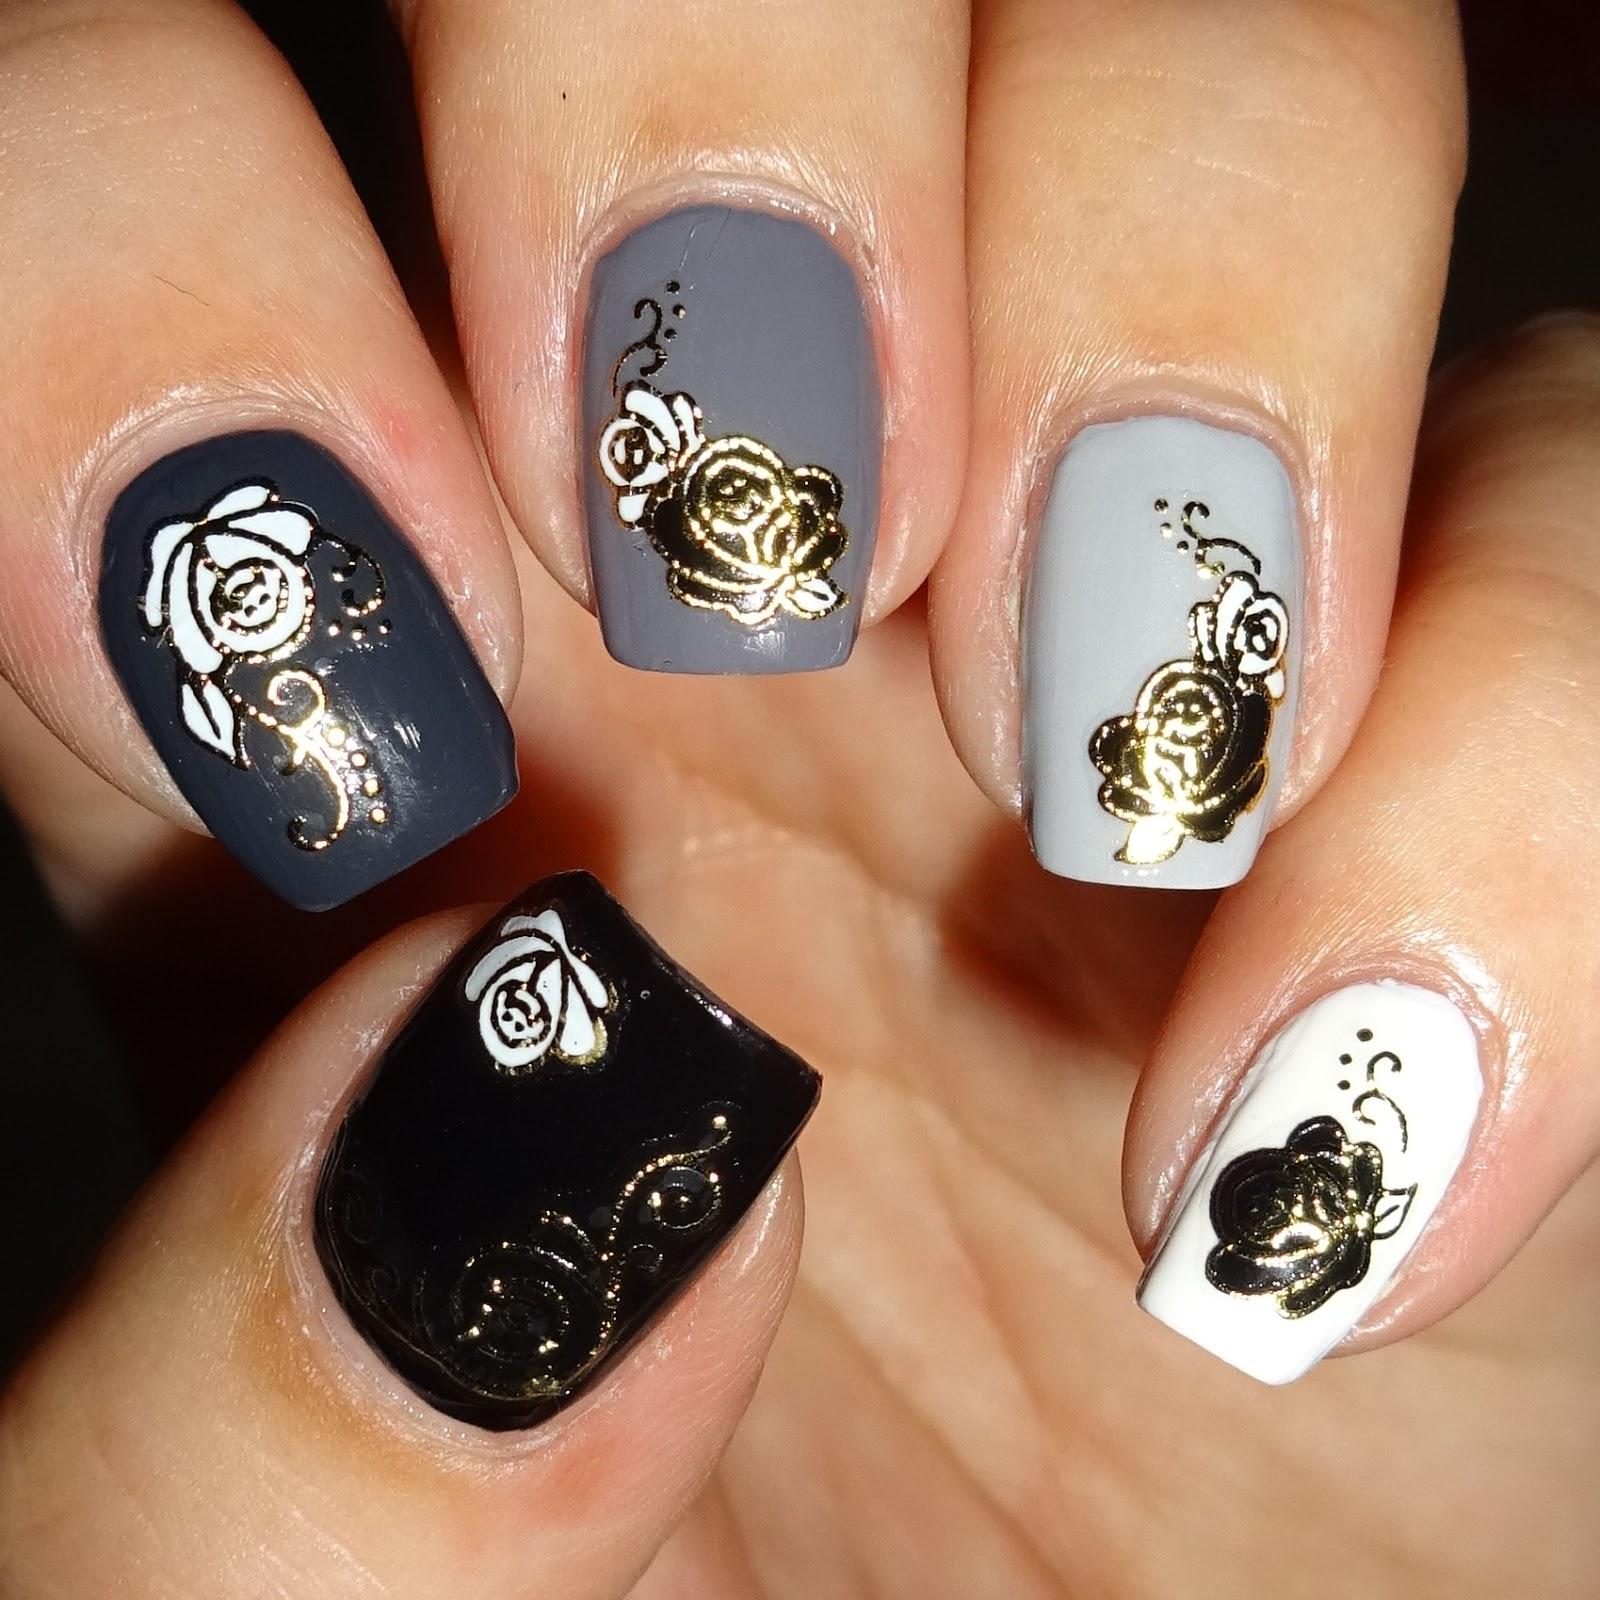 Nail Art Design For Spring 2015 Hession Hairdressing